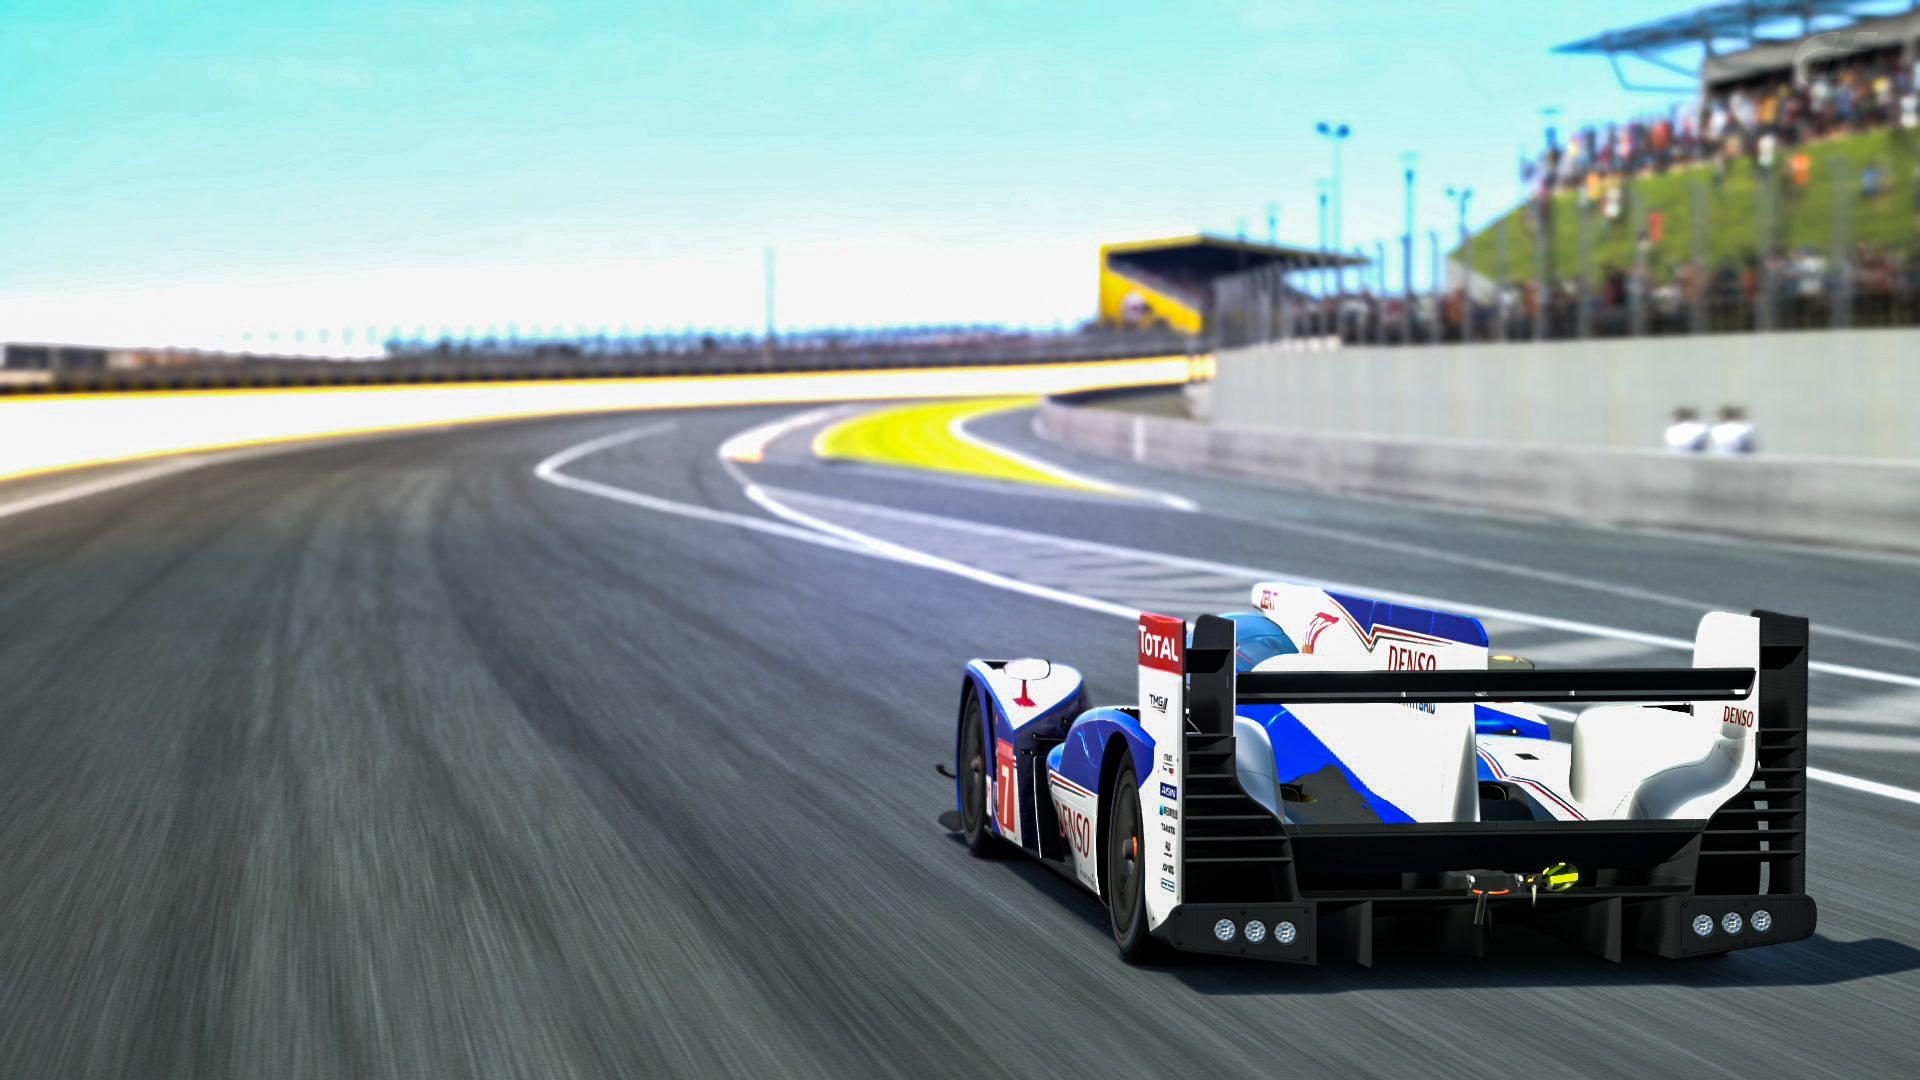 Circuit de la Sarthe 2013_6.jpg